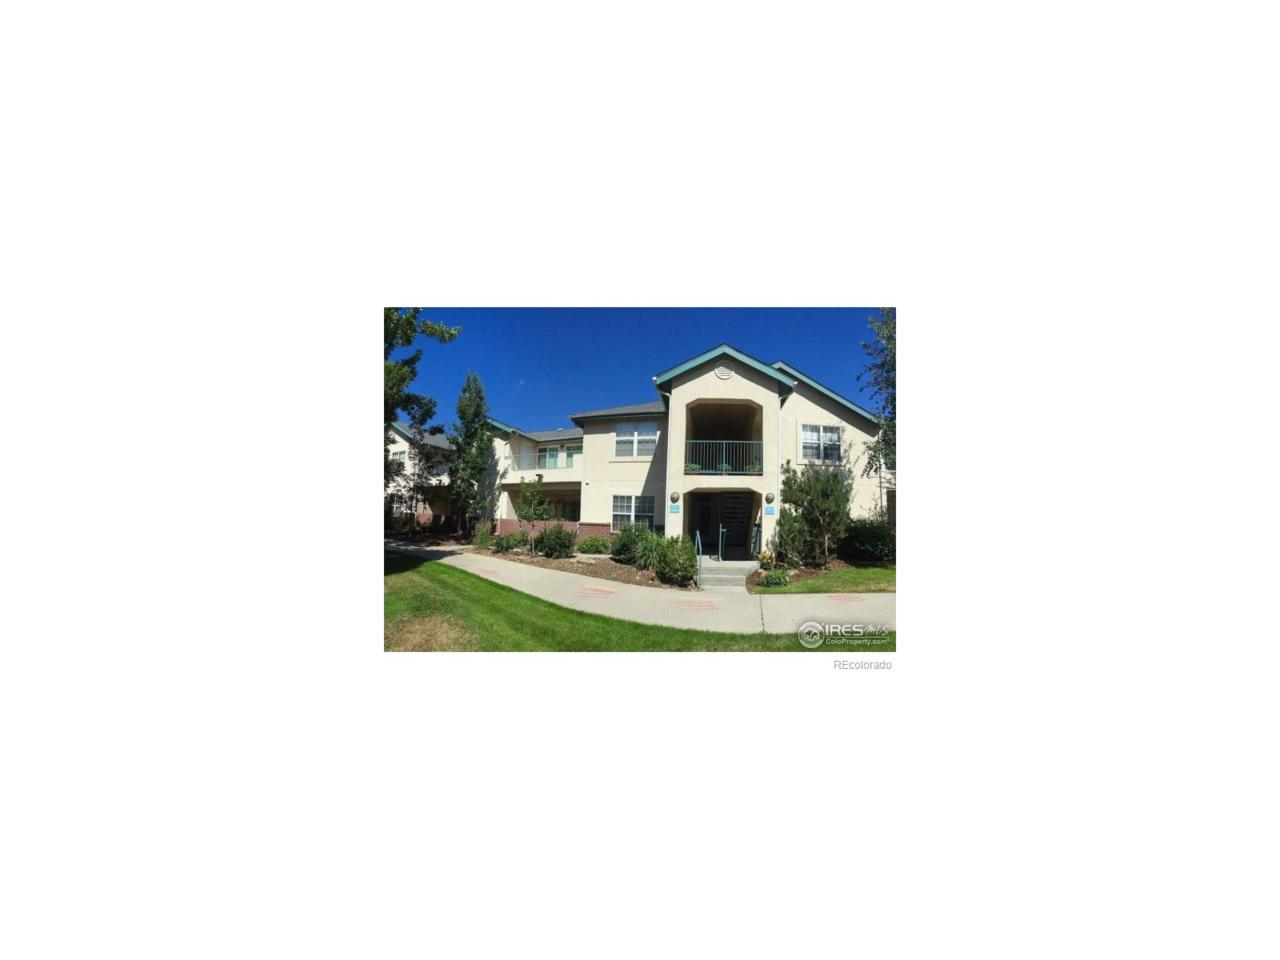 540 Mohawk Drive #16, Boulder, CO 80303 (MLS #1538063) :: 8z Real Estate